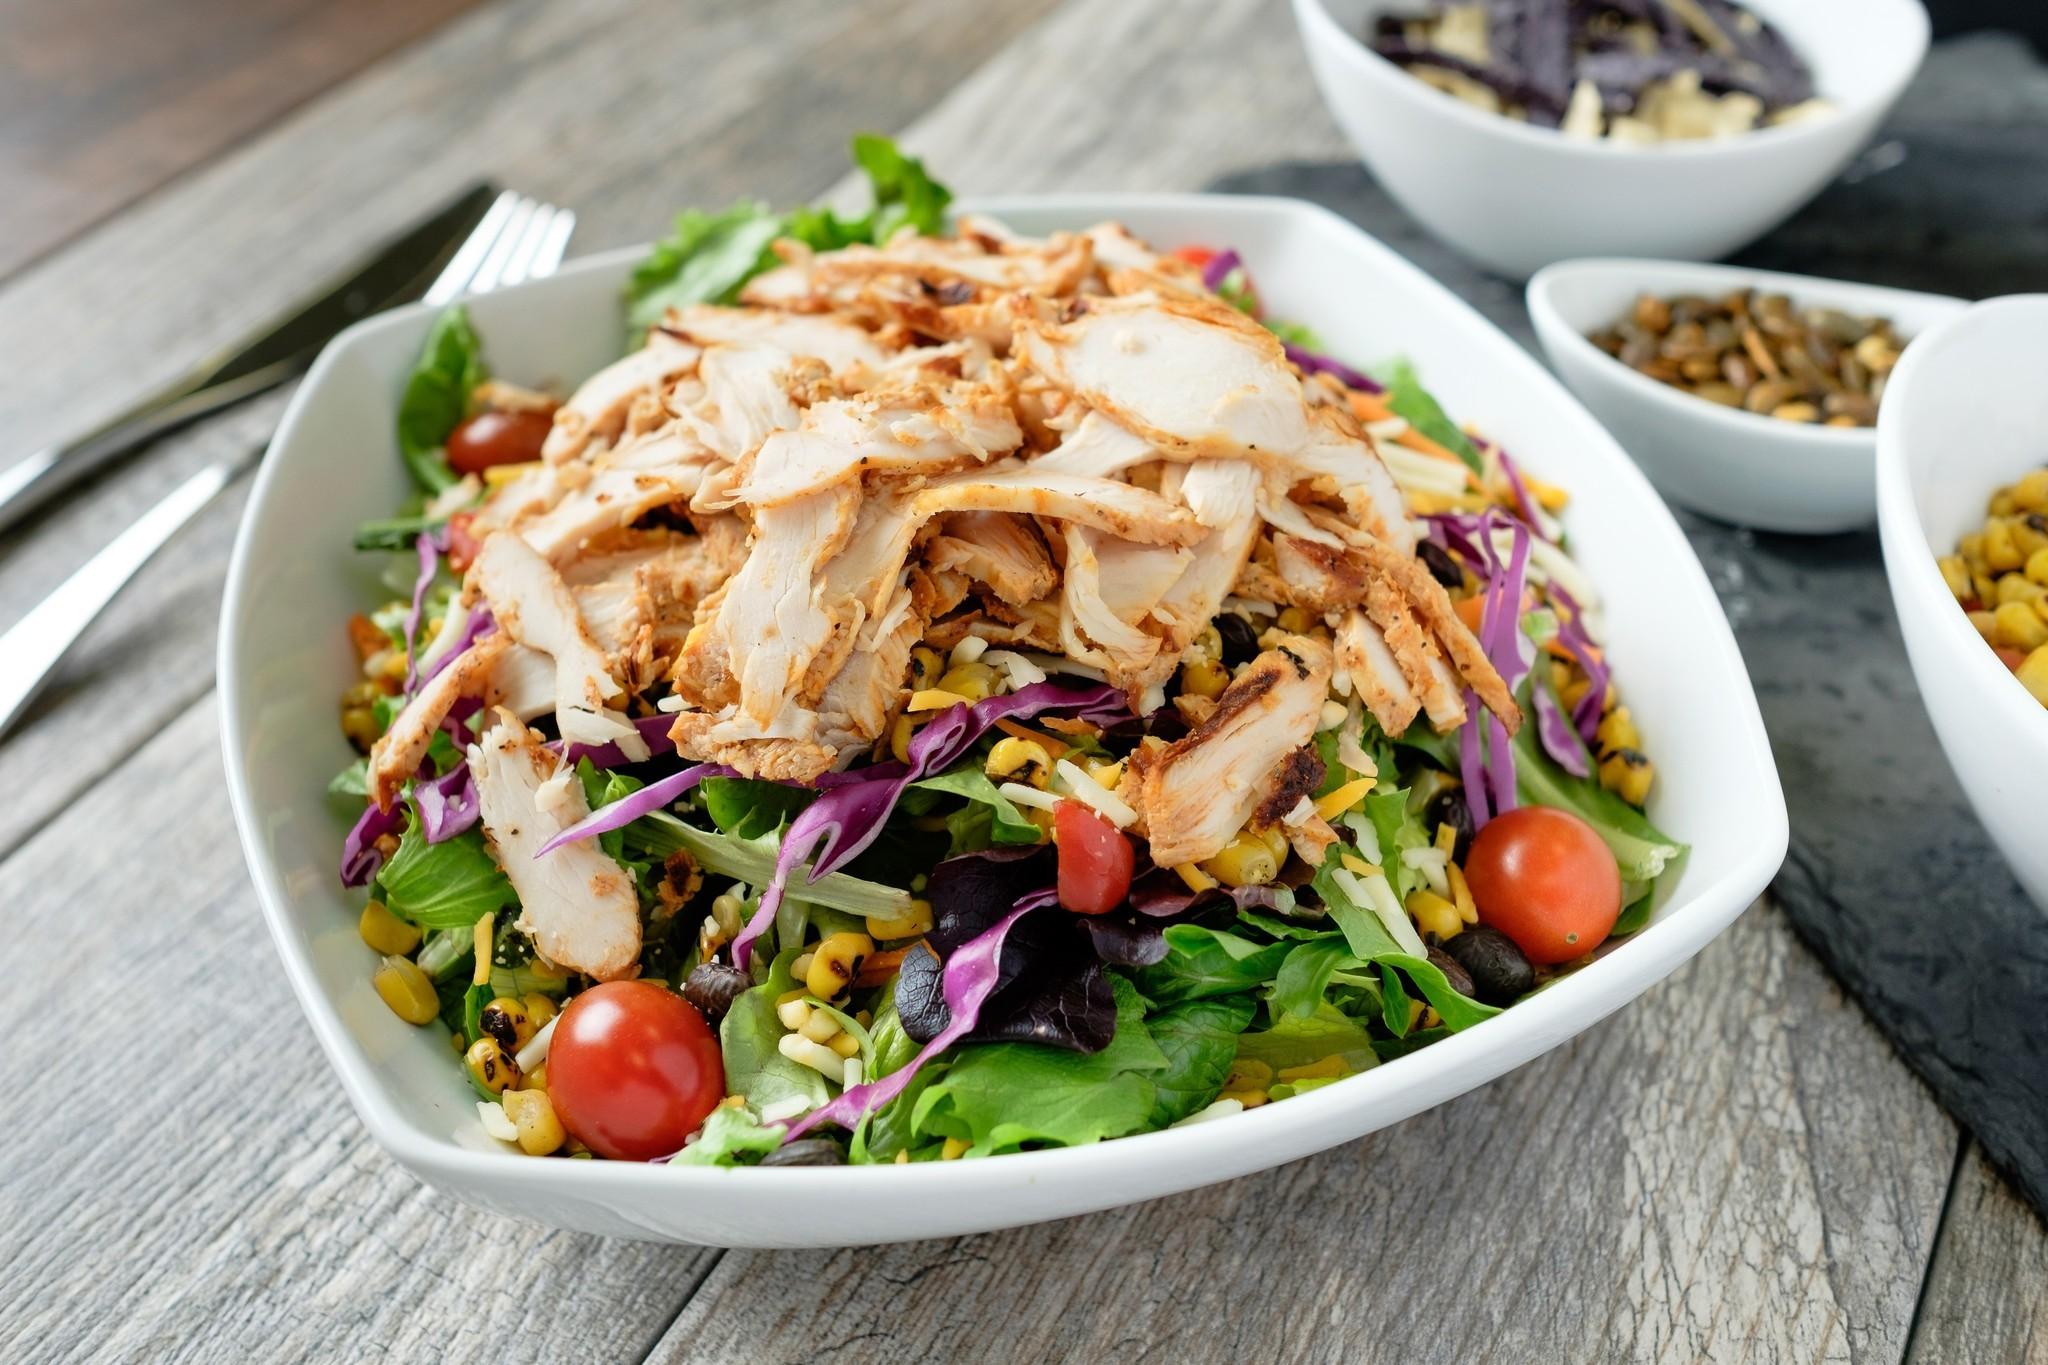 Chick Fil A Salad Dressings